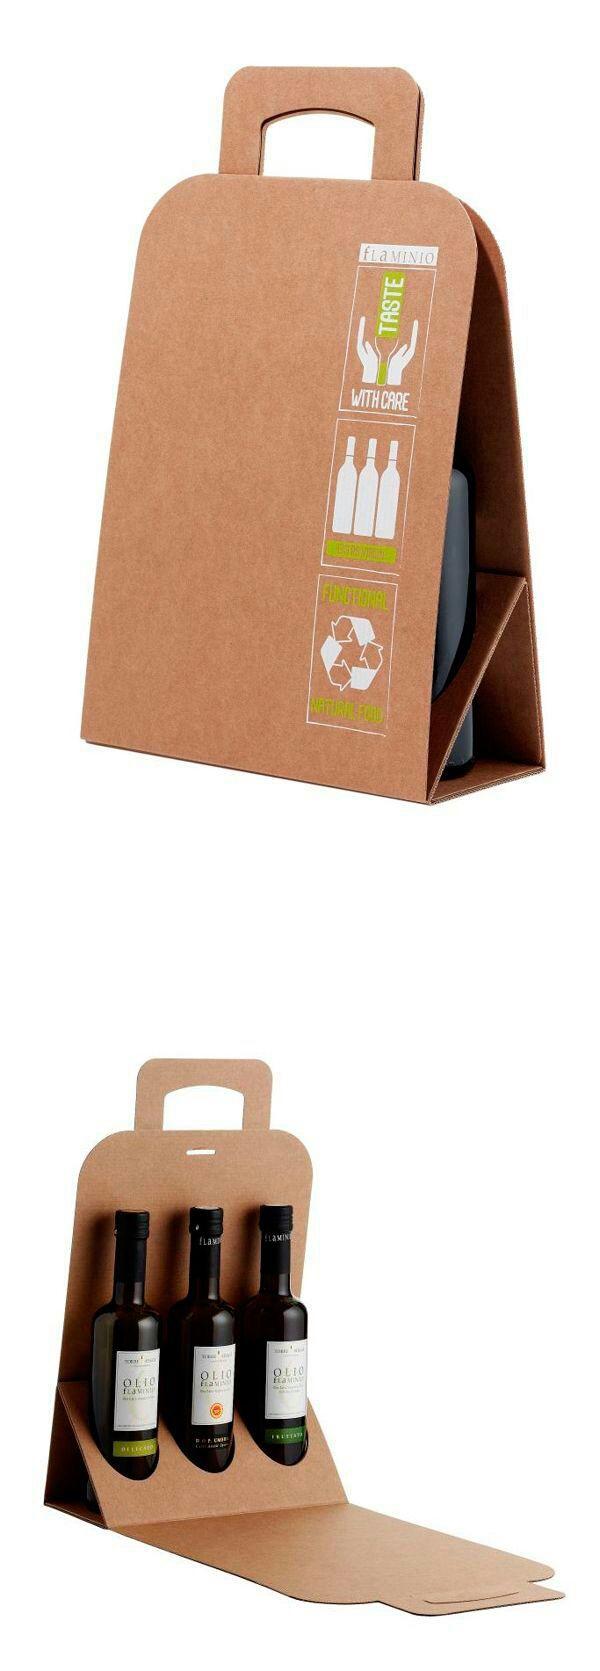 Packaging 饮料提袋